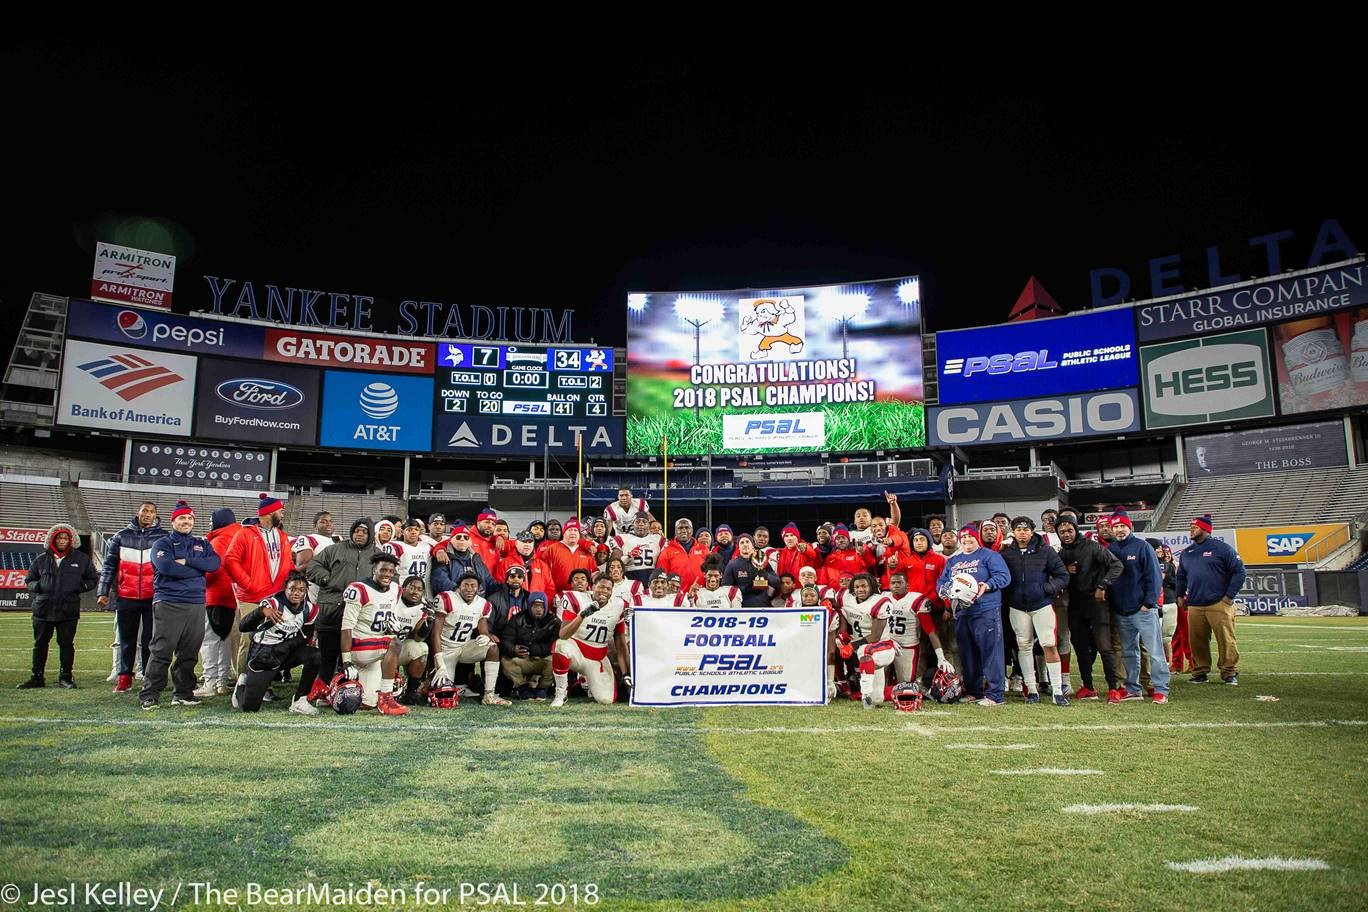 Football Champions at Yankees stadium posing after the big win